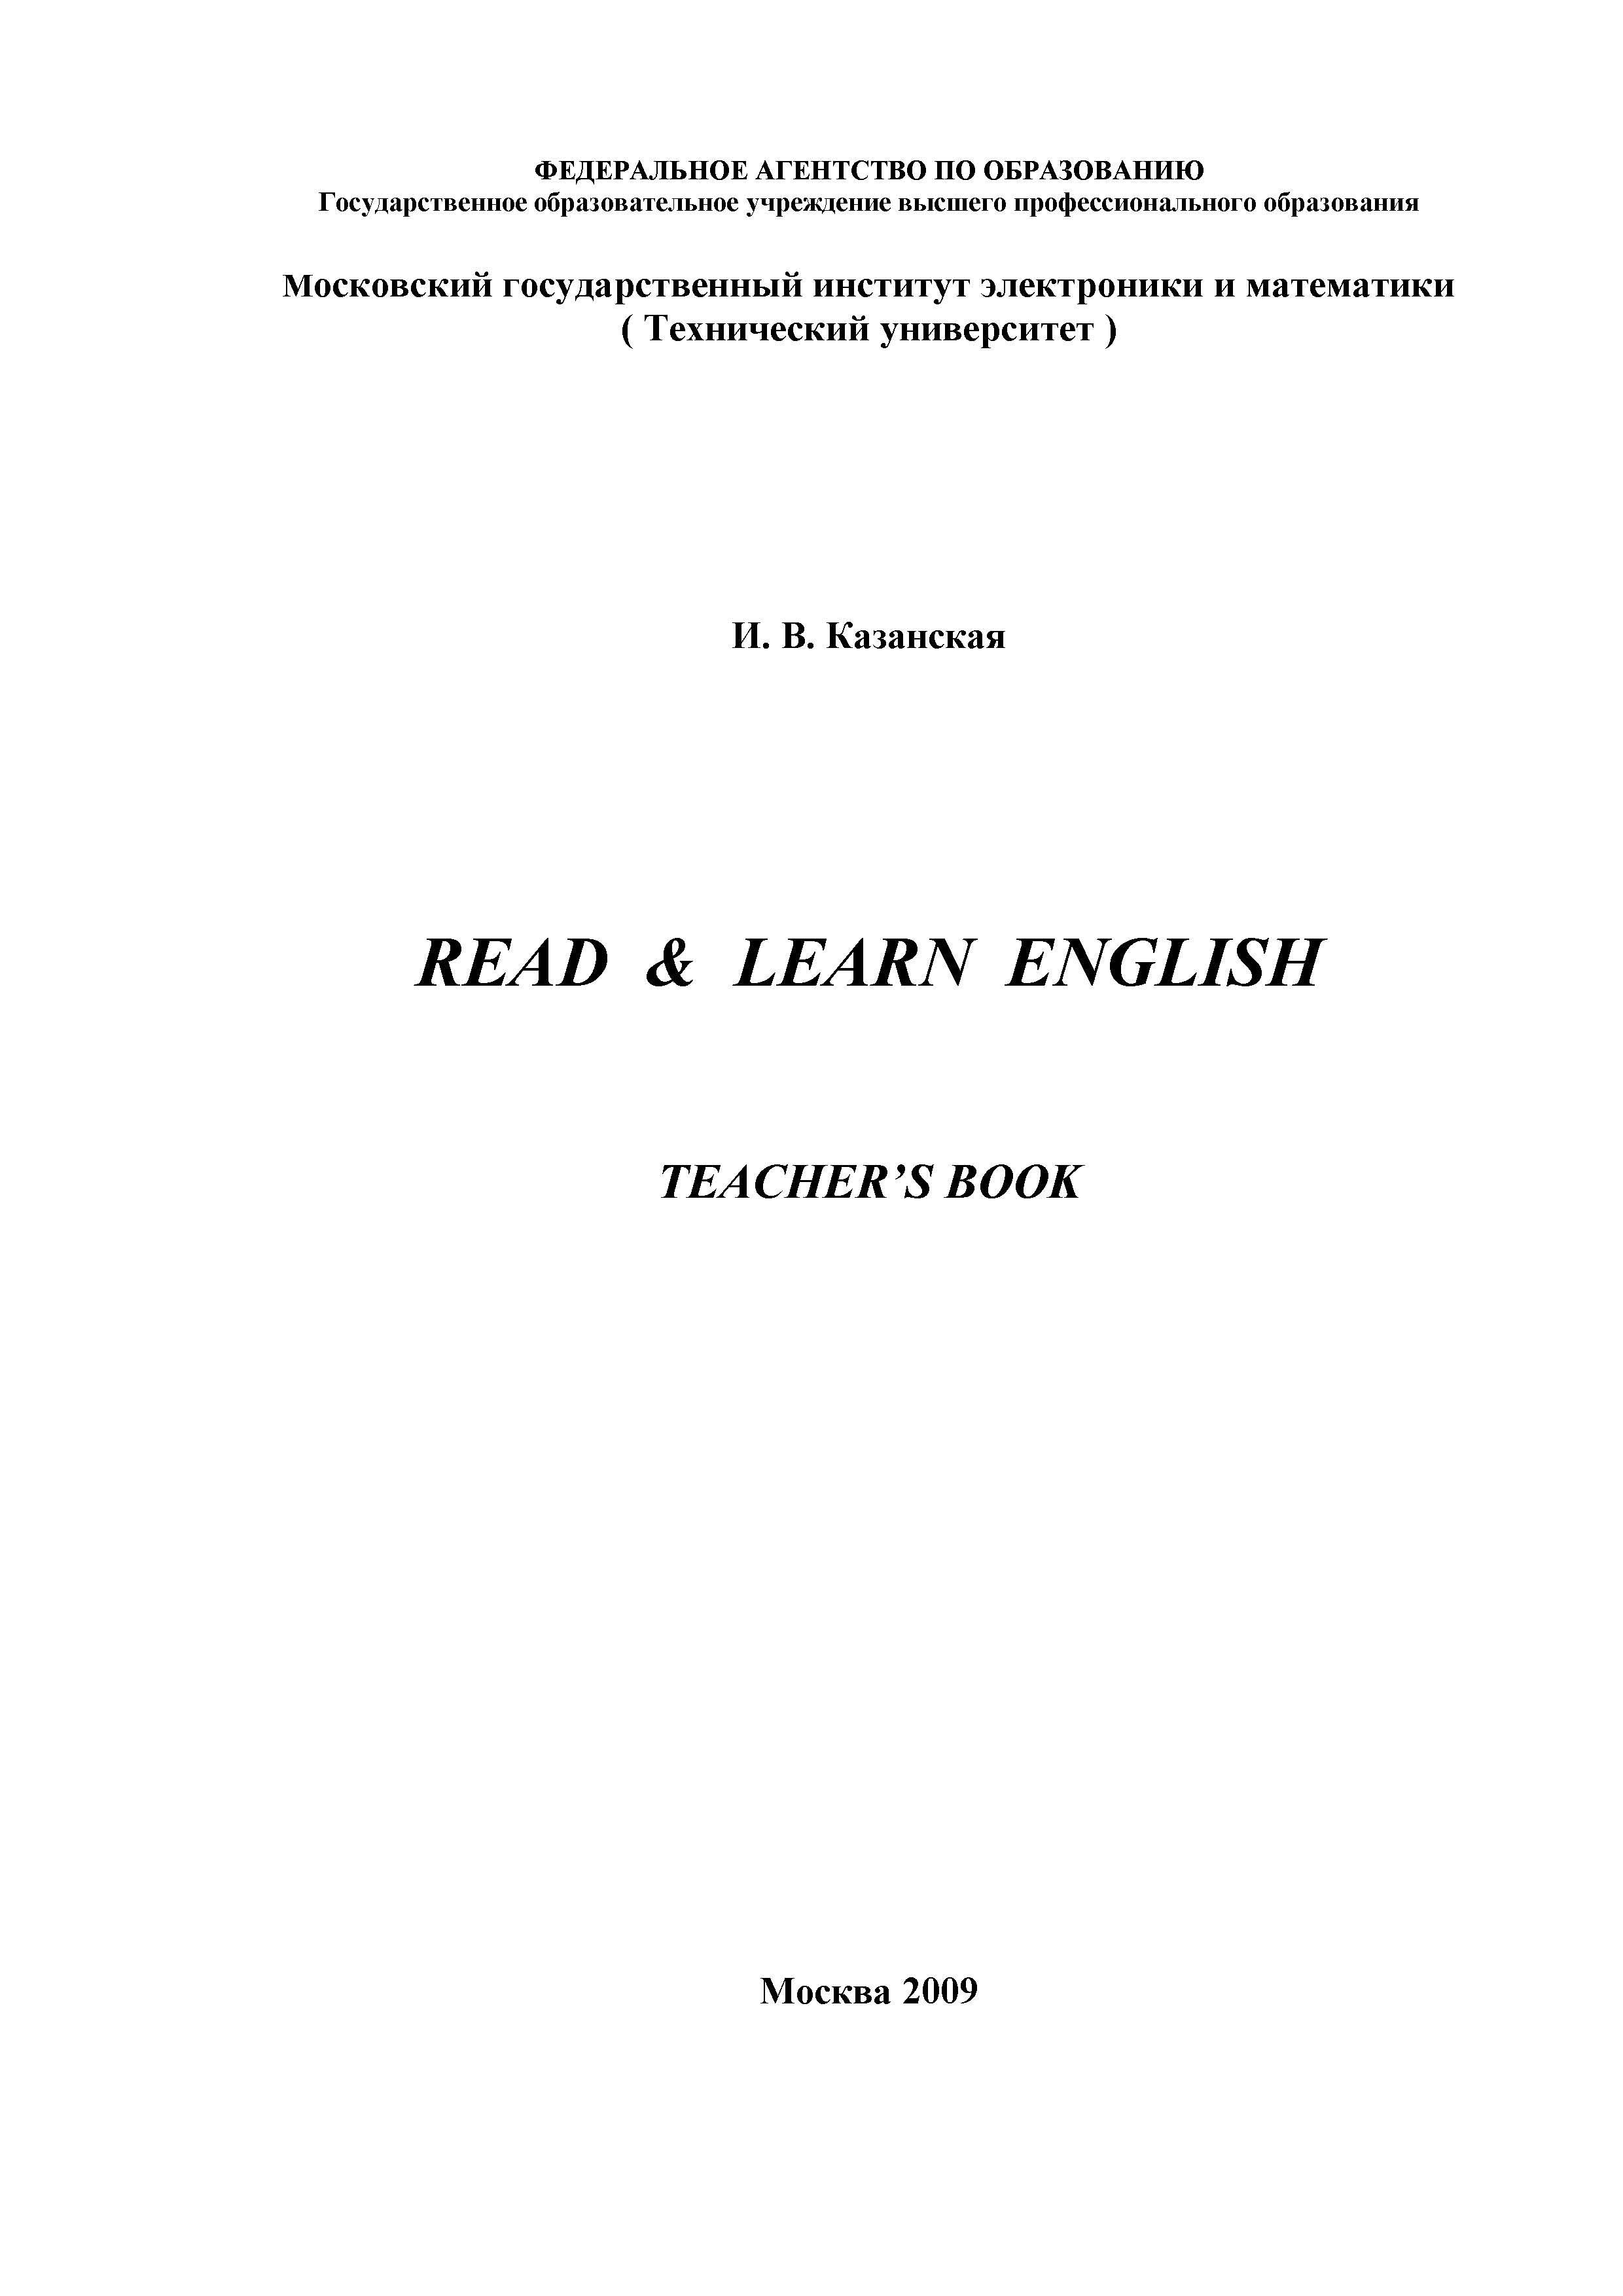 Read & Learn English. Teacher's Book: Учебное пособие